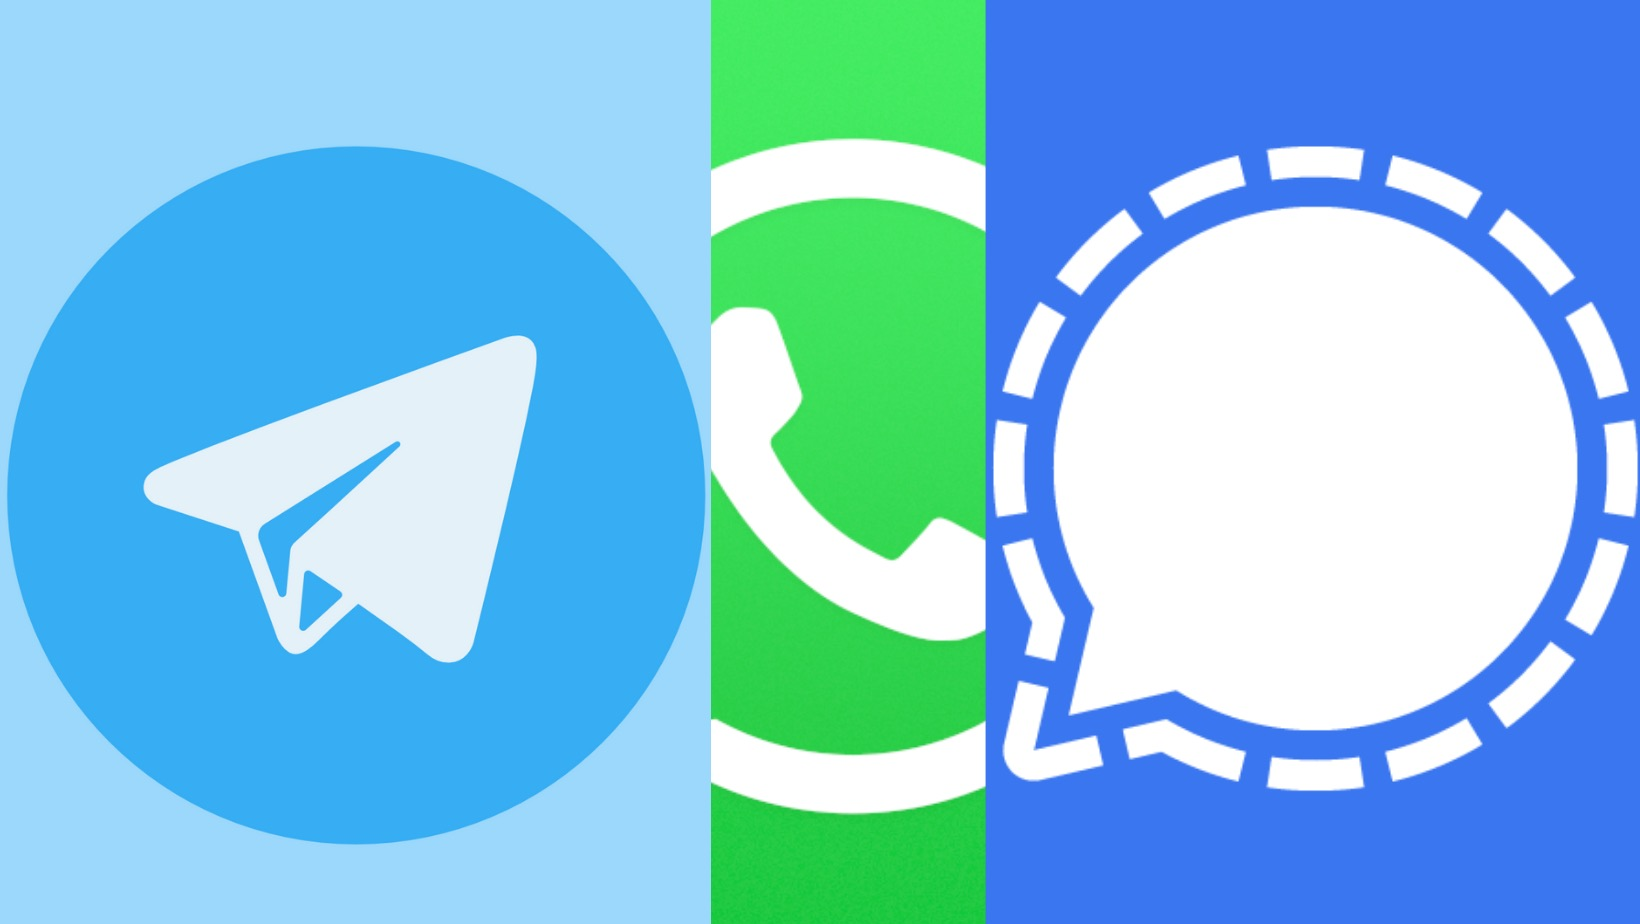 Éxodo de WhatsApp: Telegram vs Signal, ¿cuál es mejor? - DiarioBitcoin